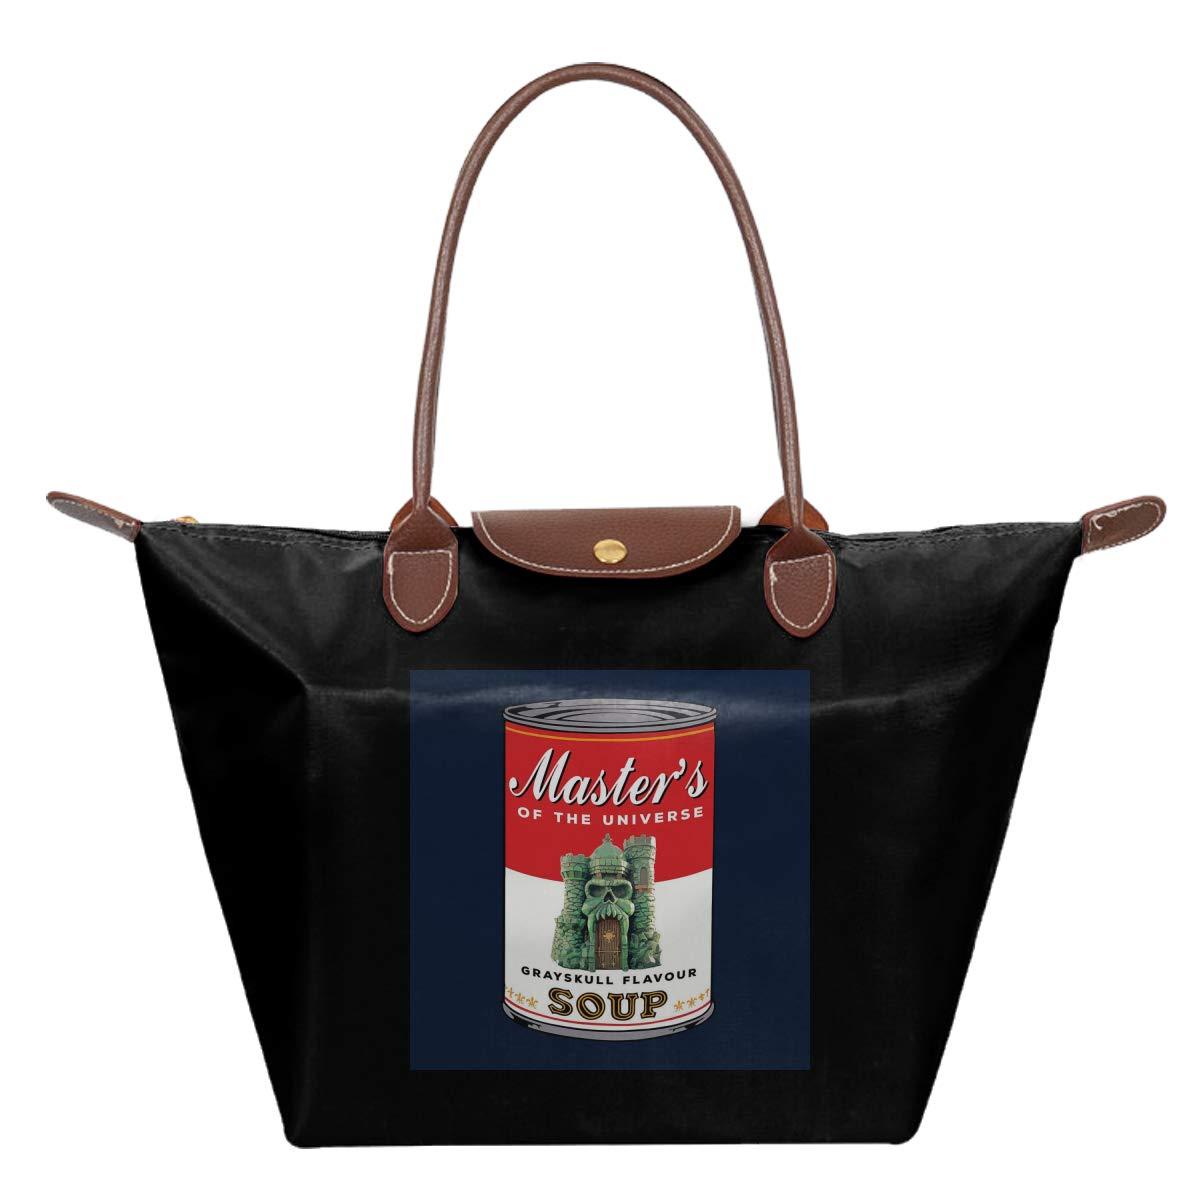 He Man Masters Of Universe Grayskull Flavoured Soup Waterproof Leather Folded Messenger Nylon Bag Travel Tote Hopping Folding School Handbags